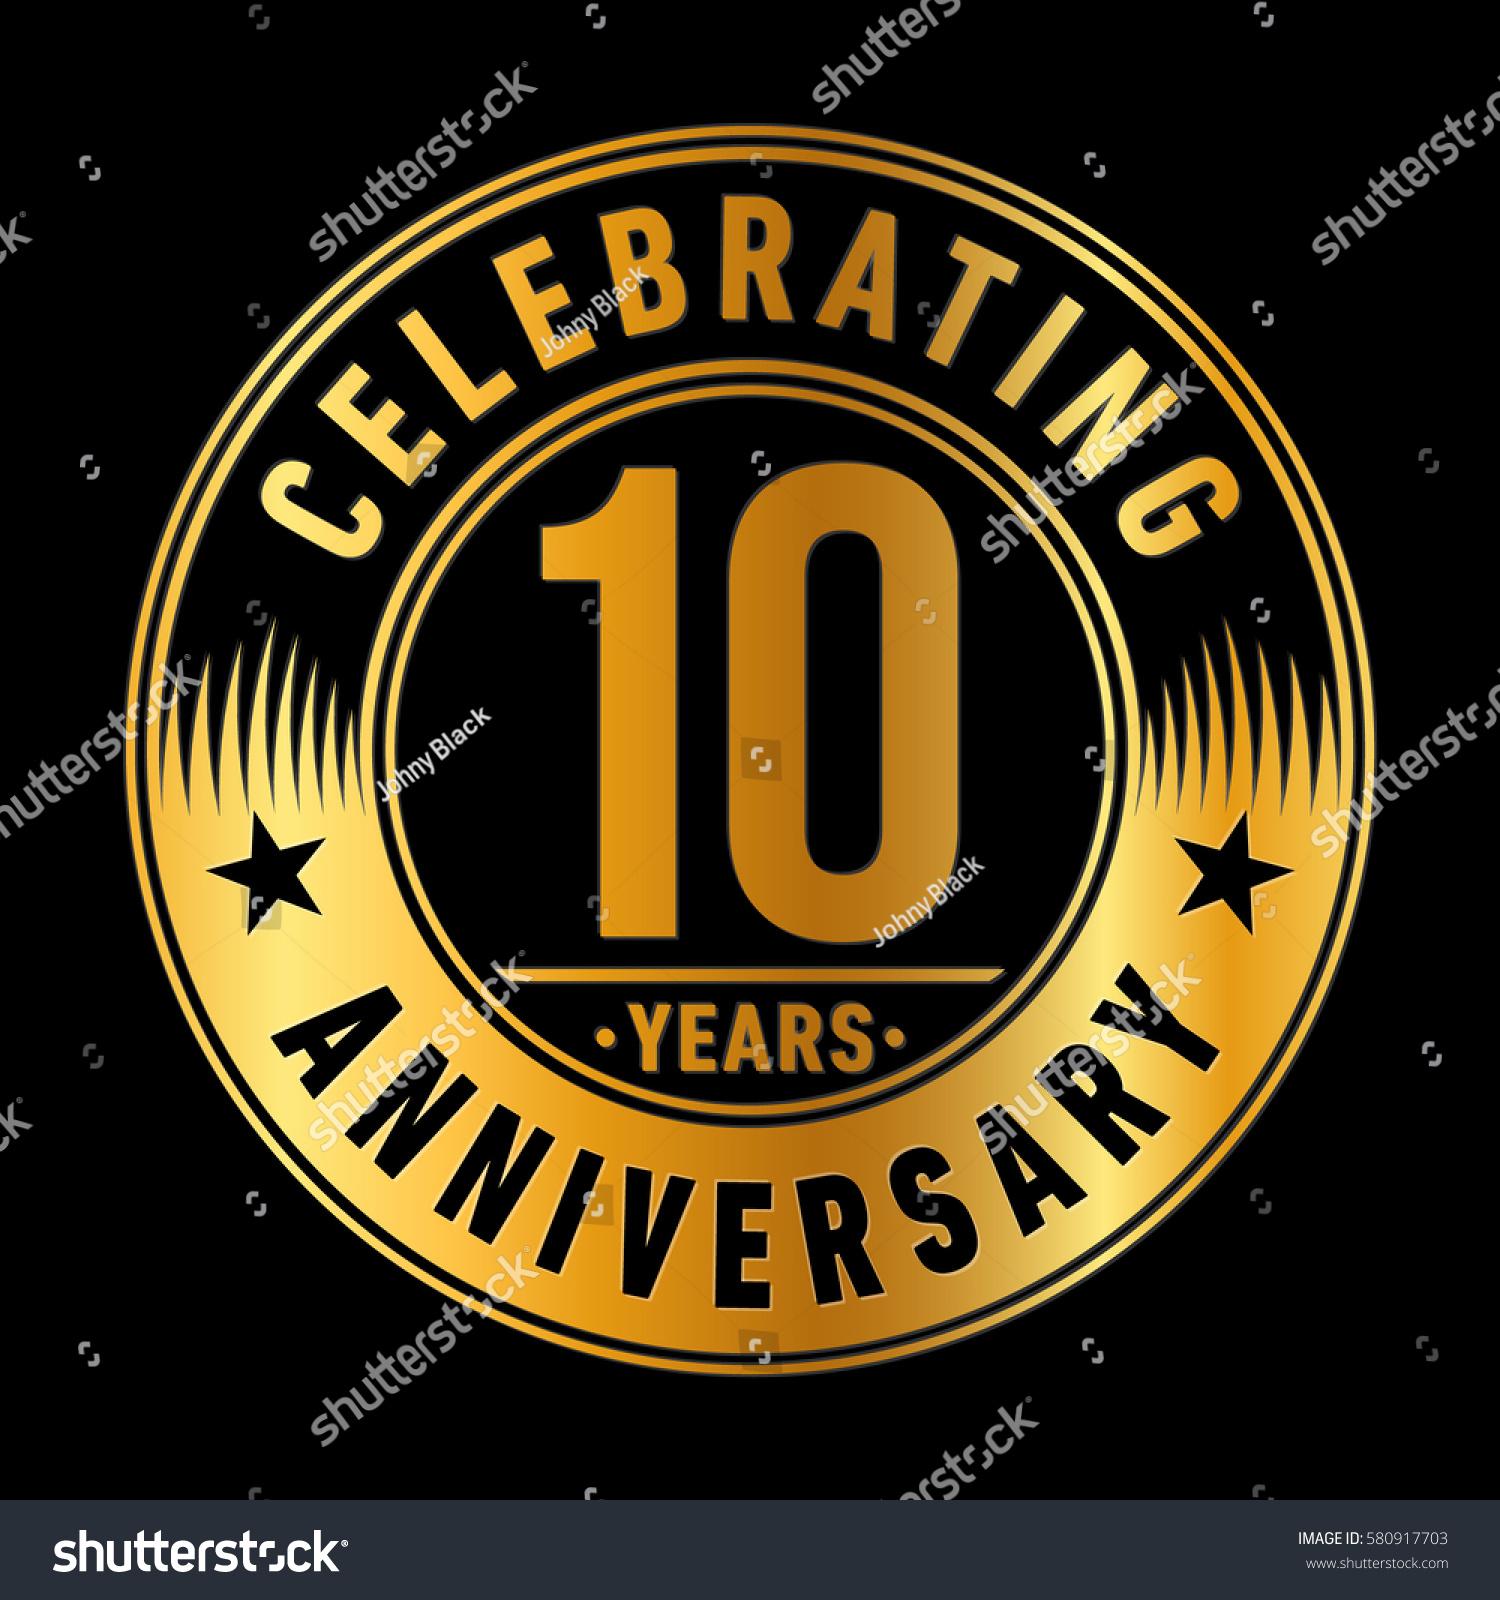 anniversary logo vector - photo #21